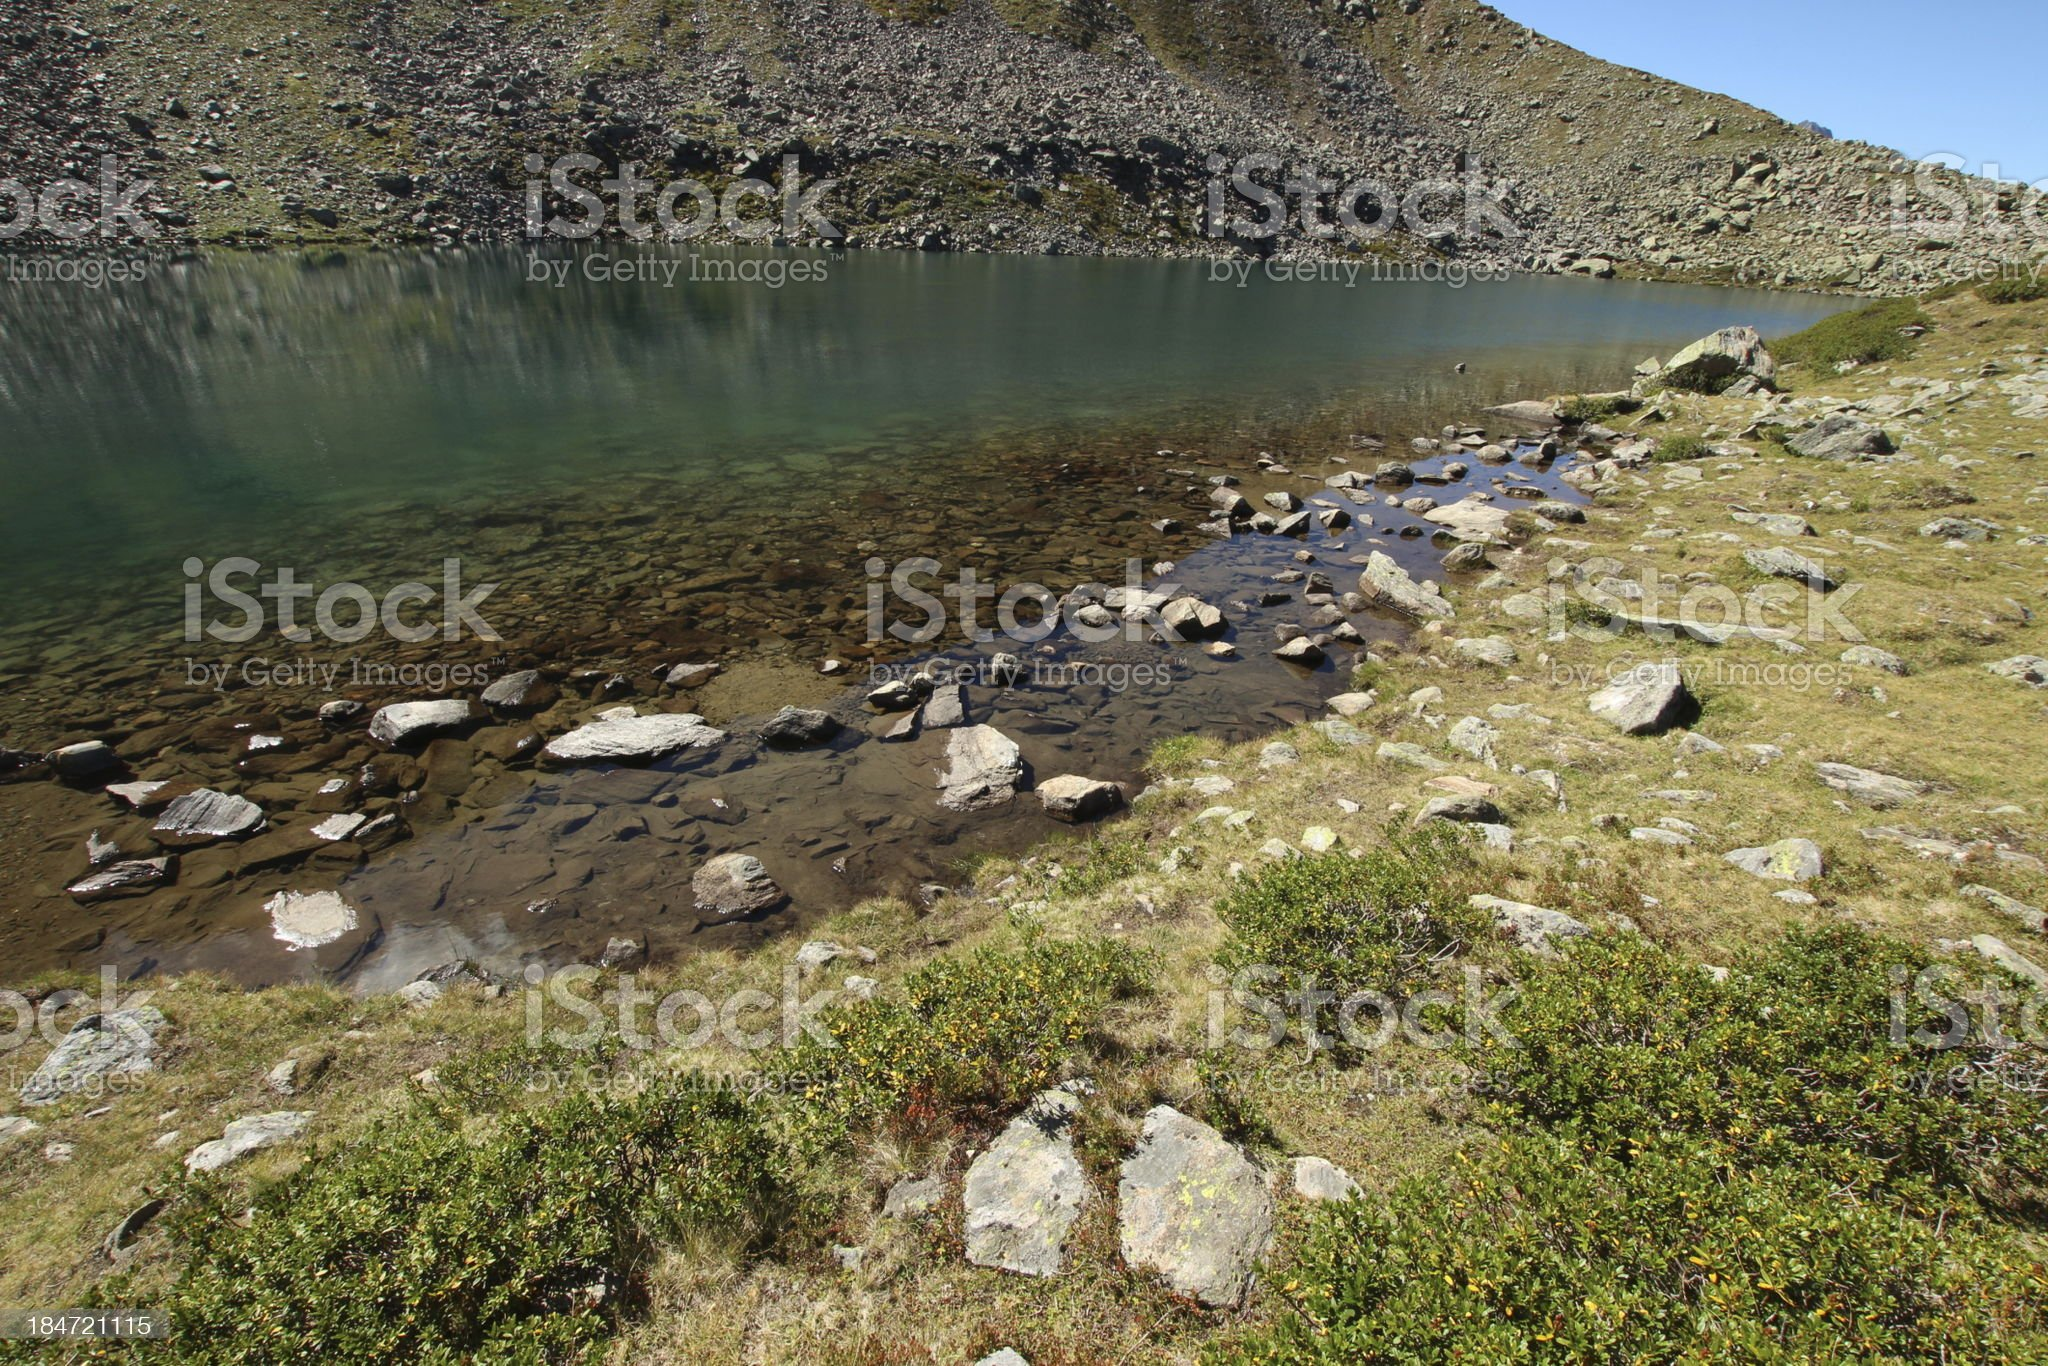 Alpine Mountain Lake Mittlerer Plenderlesee, K?htai, Tyrol, Austria royalty-free stock photo